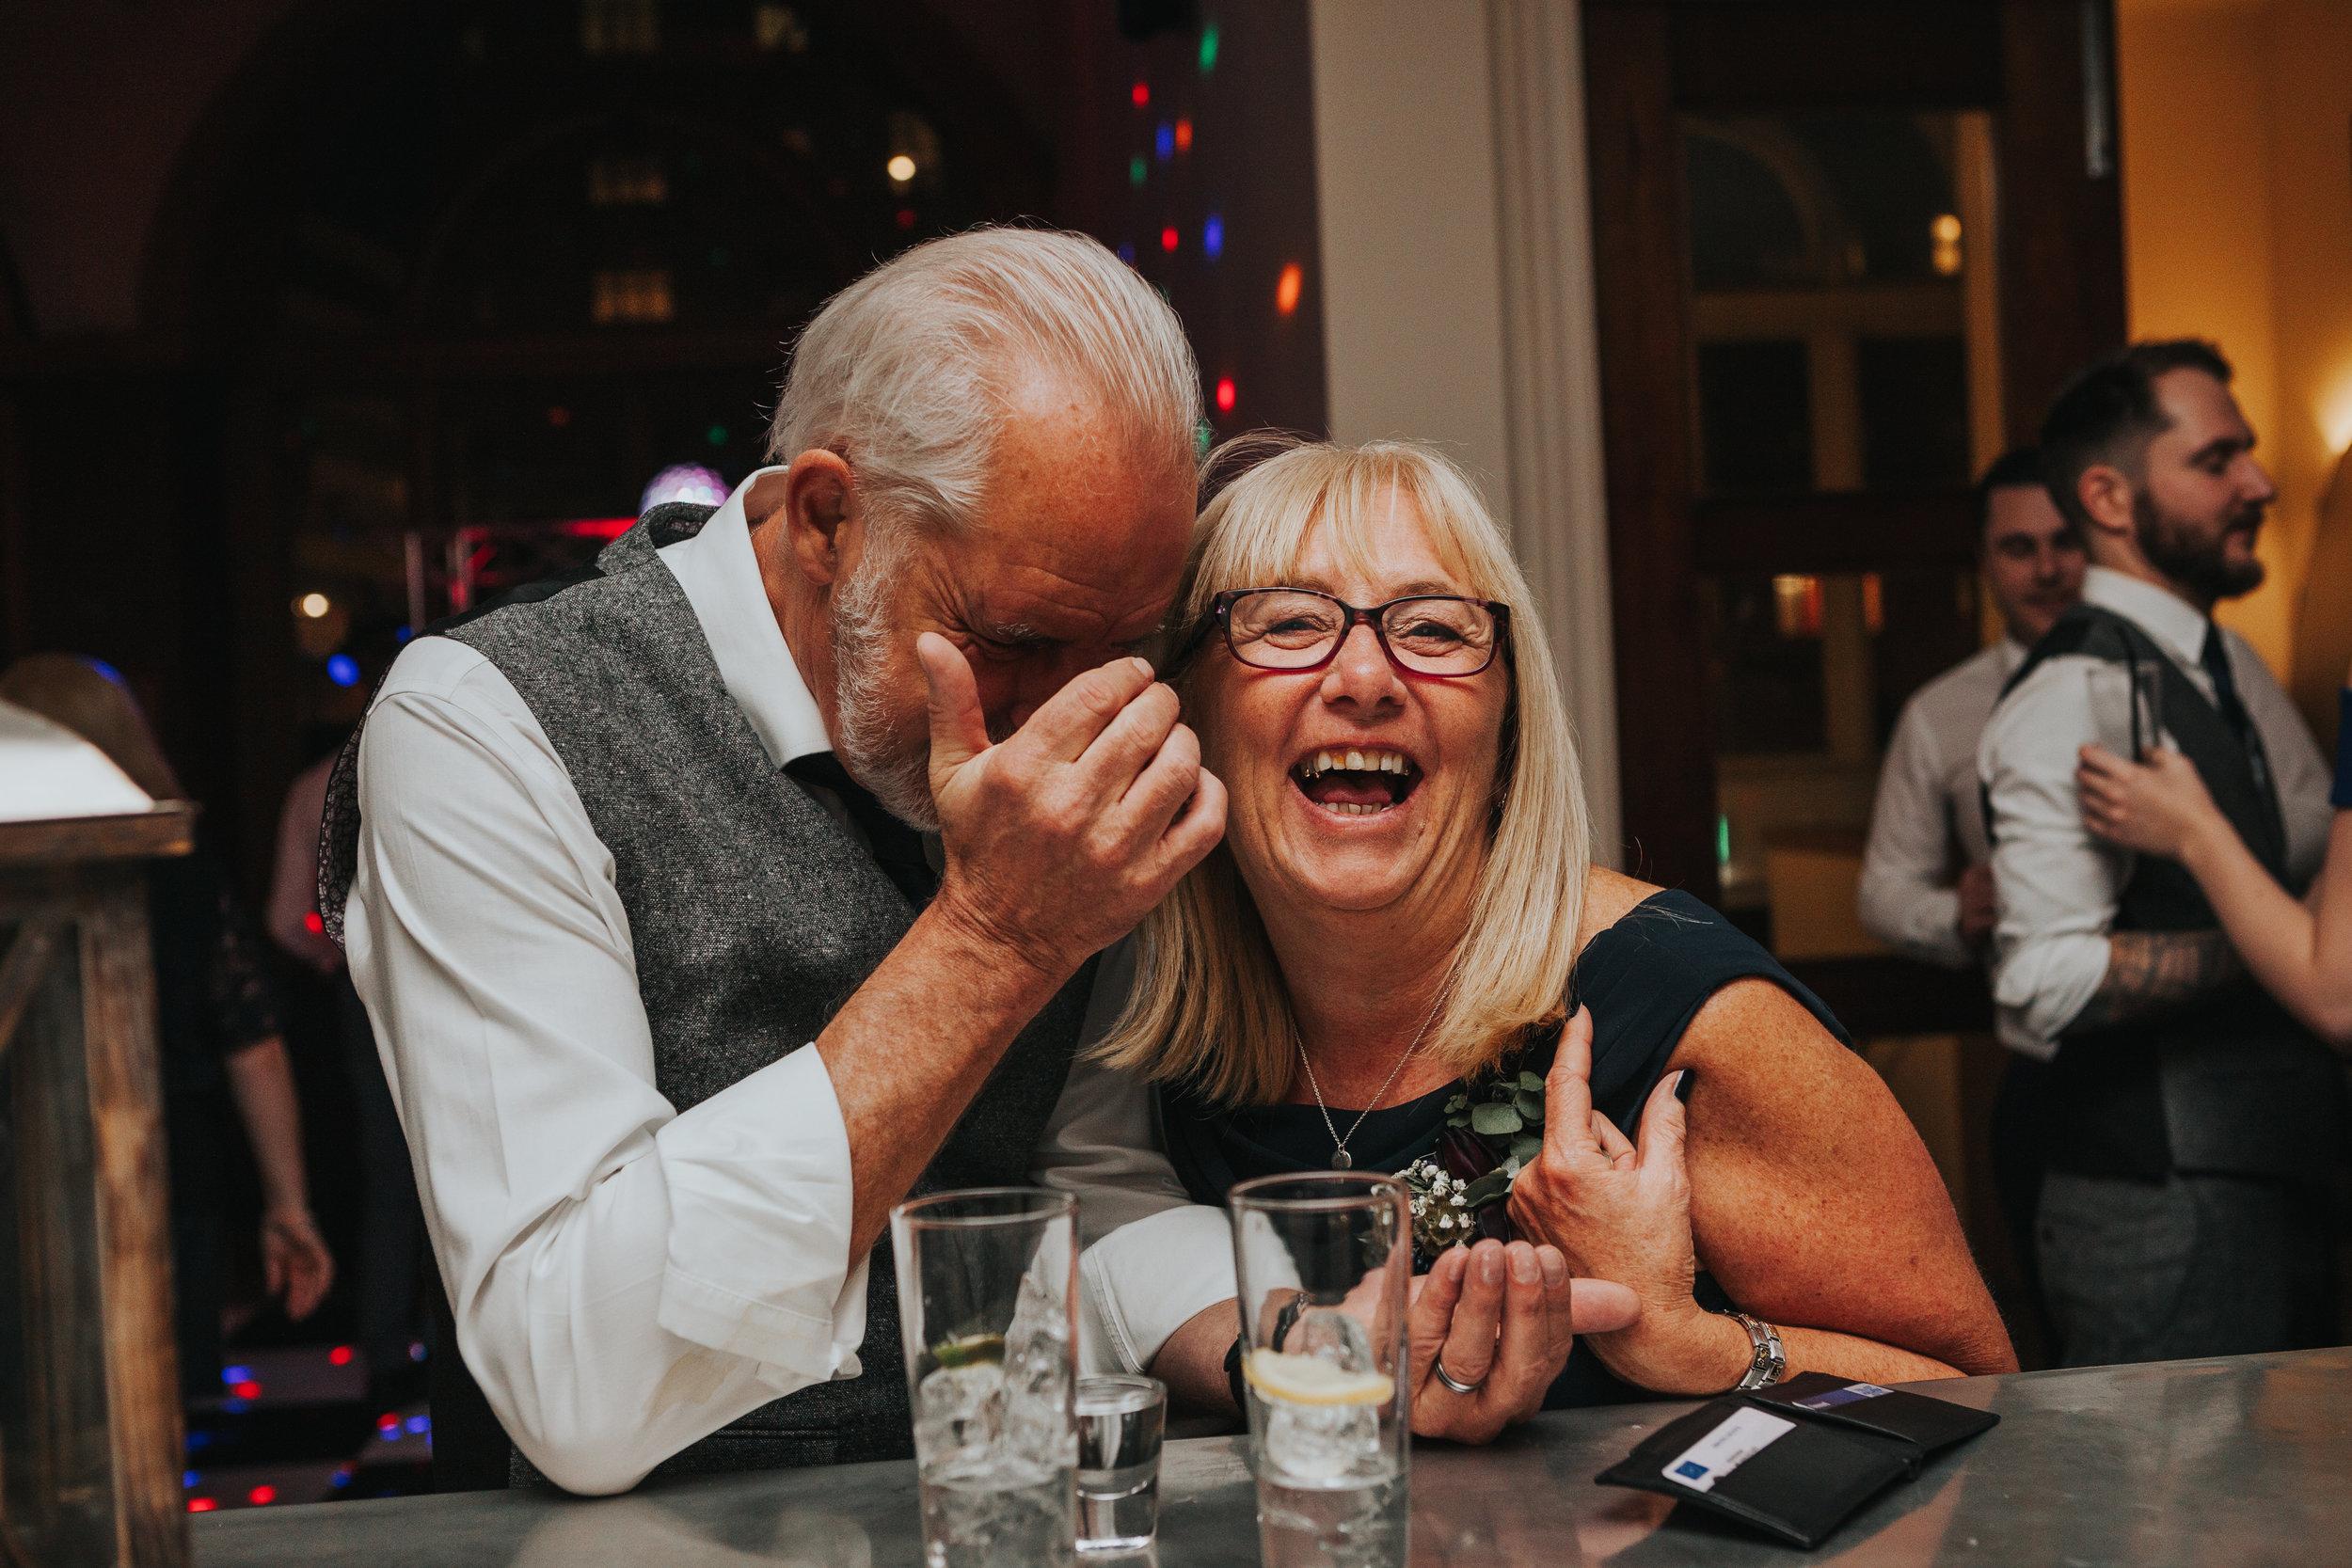 Couple laughing at bar